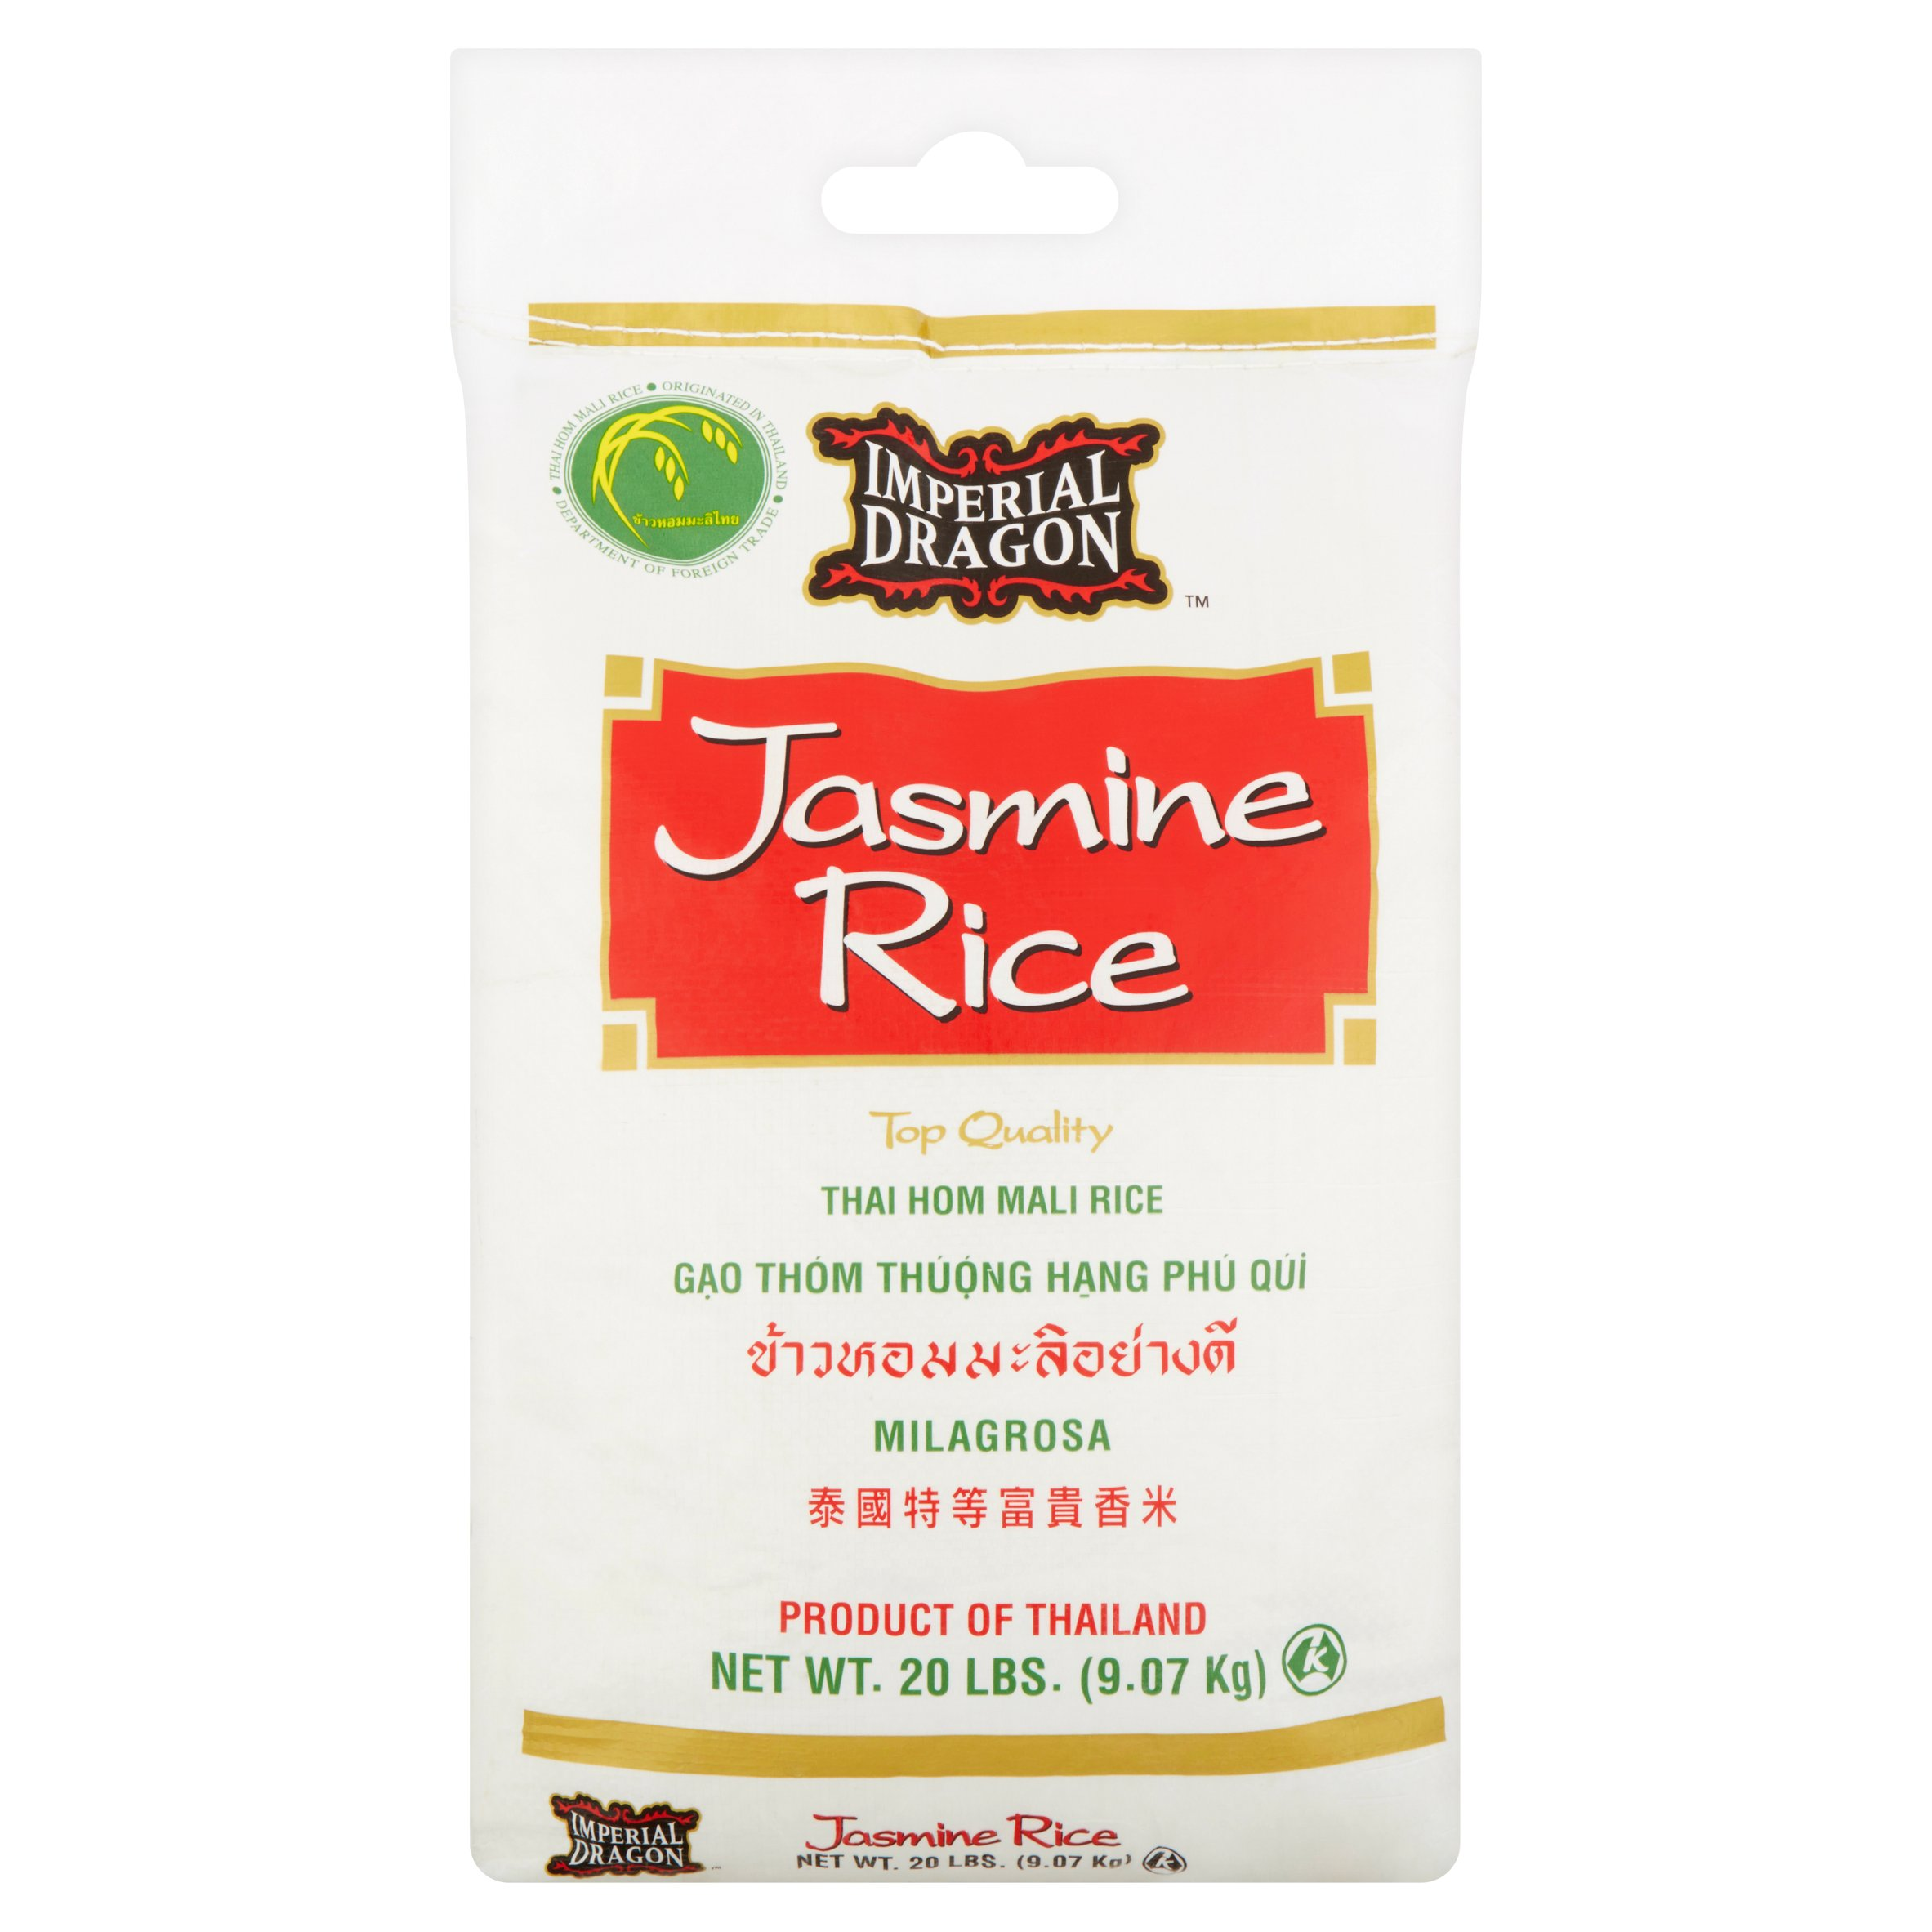 Imperial Dragon Jasmine Rice, 20 lb by Jfc International Inc.